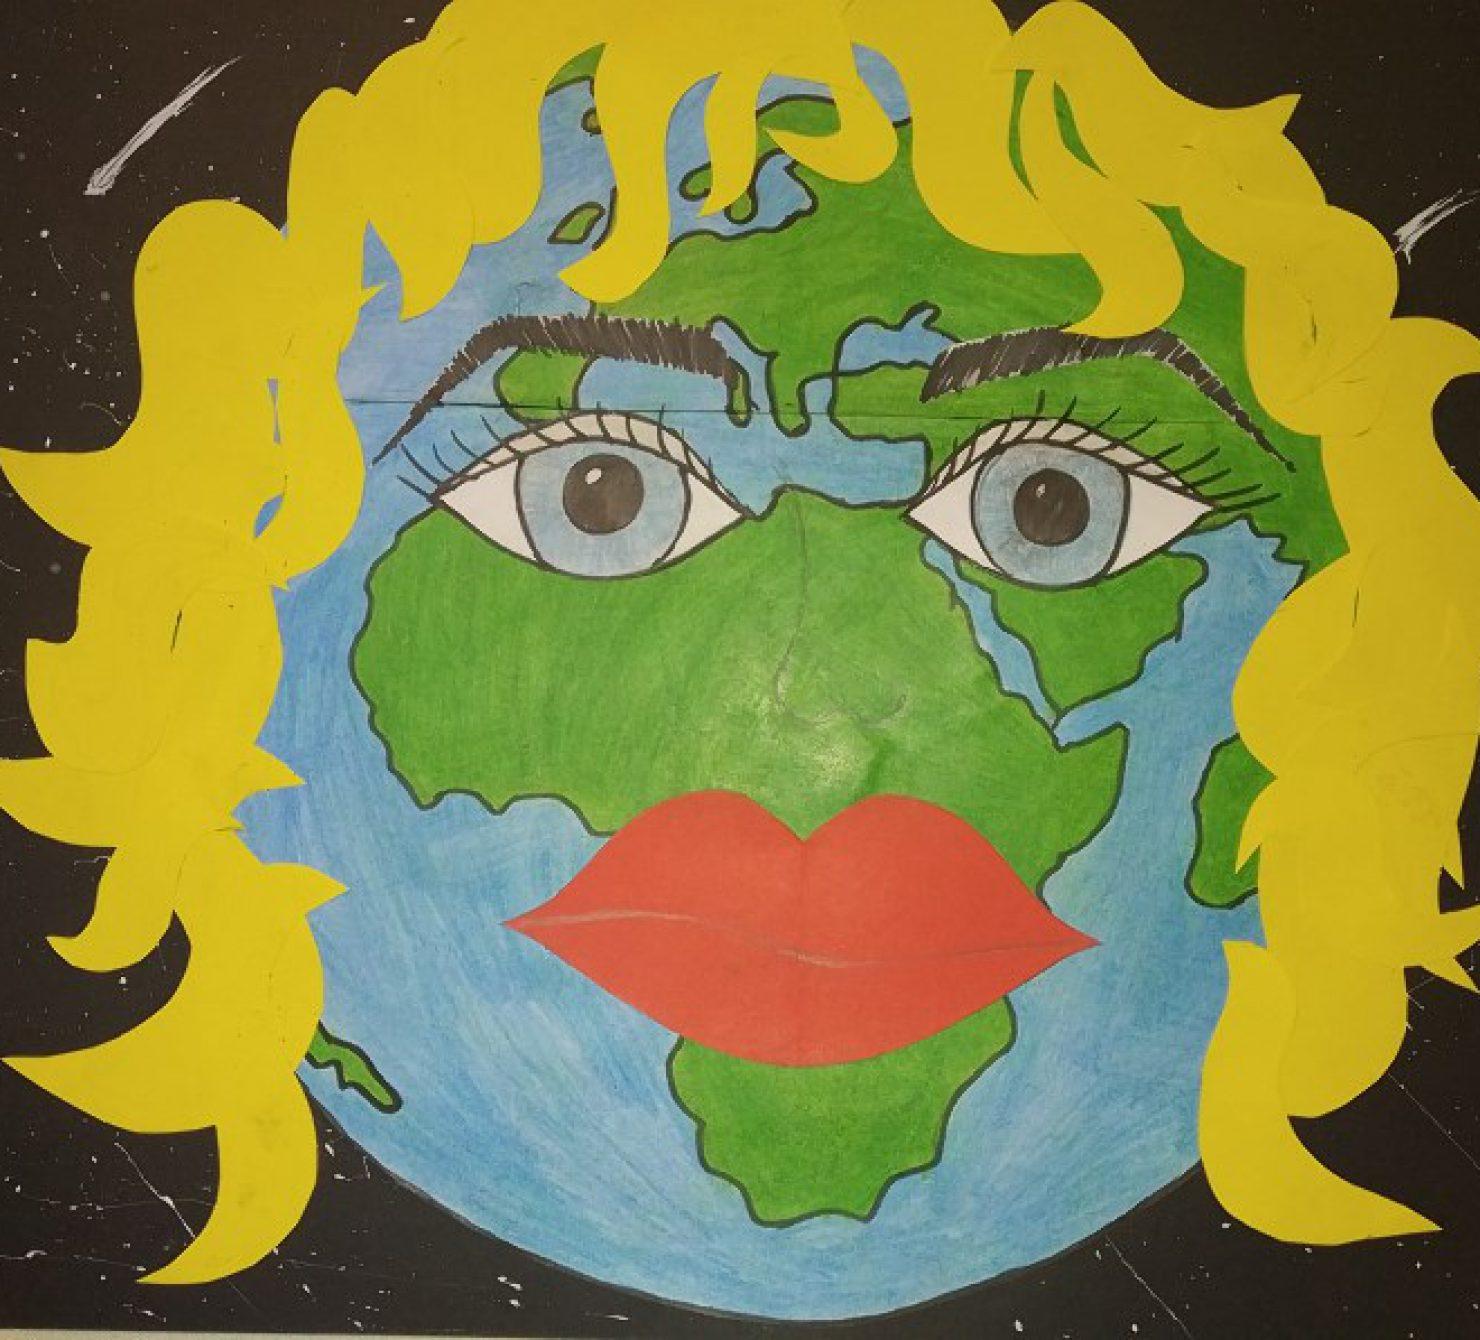 Kevin- Ziemia piękna jak moja Mama